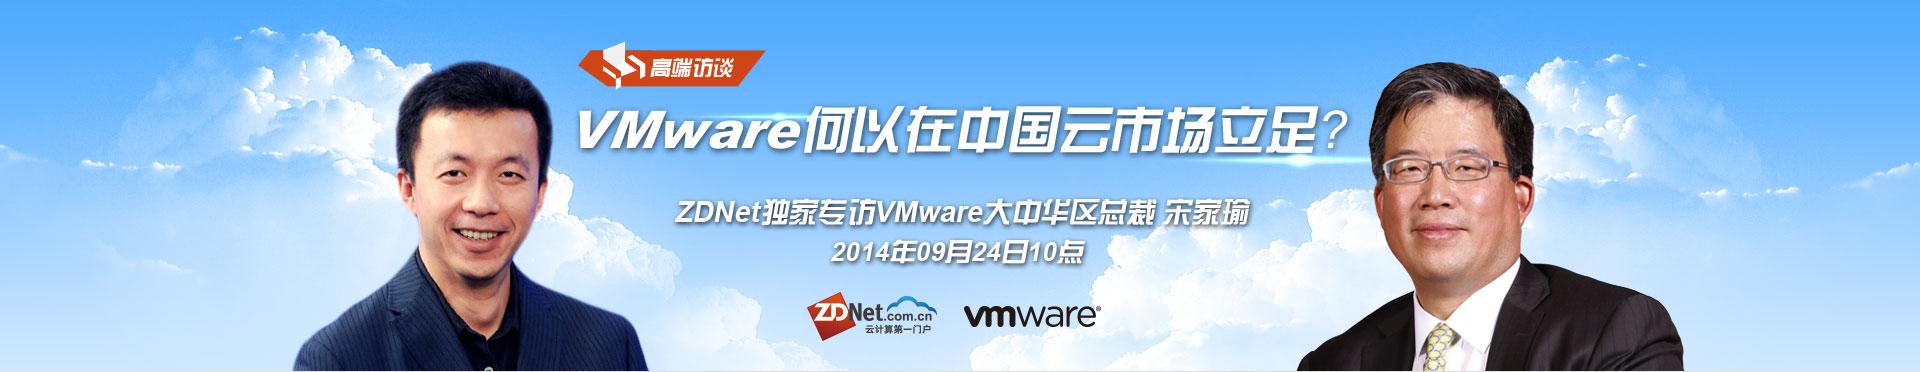 对话VMware宋家瑜:VMware何以在中国云市场立足?